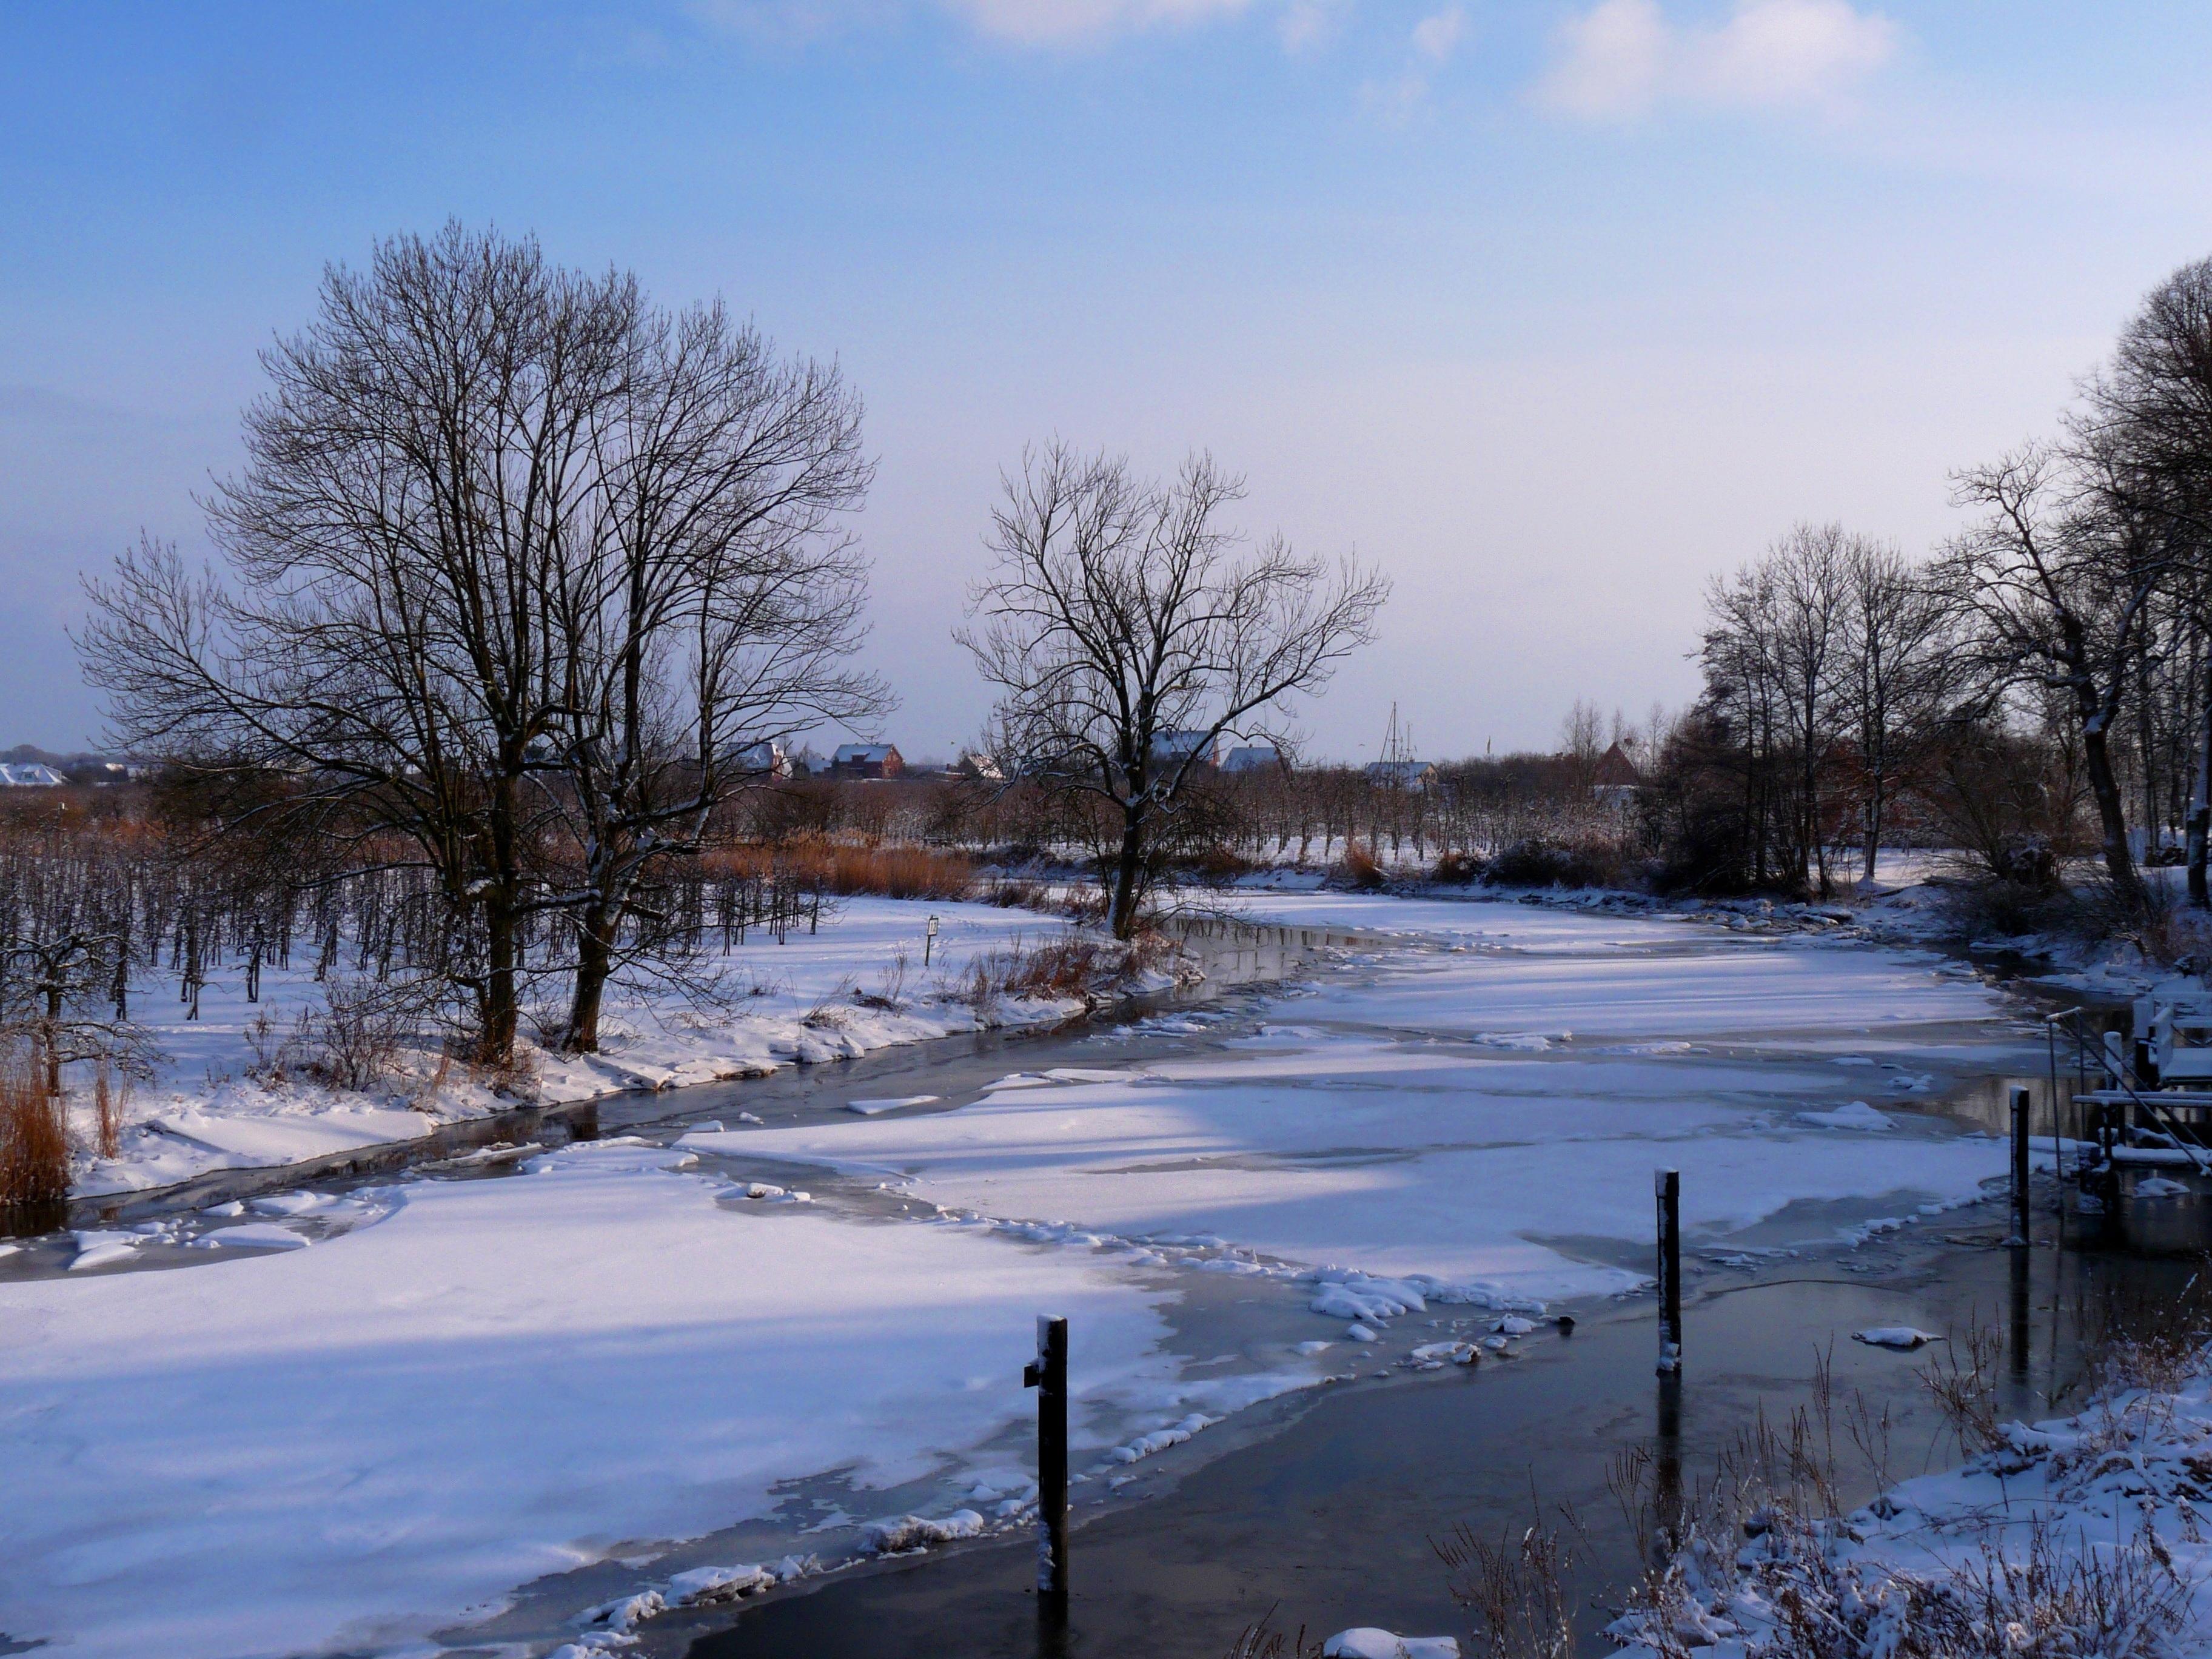 51199 скачать обои Природа, Зима, Лед, Река, Снег - заставки и картинки бесплатно